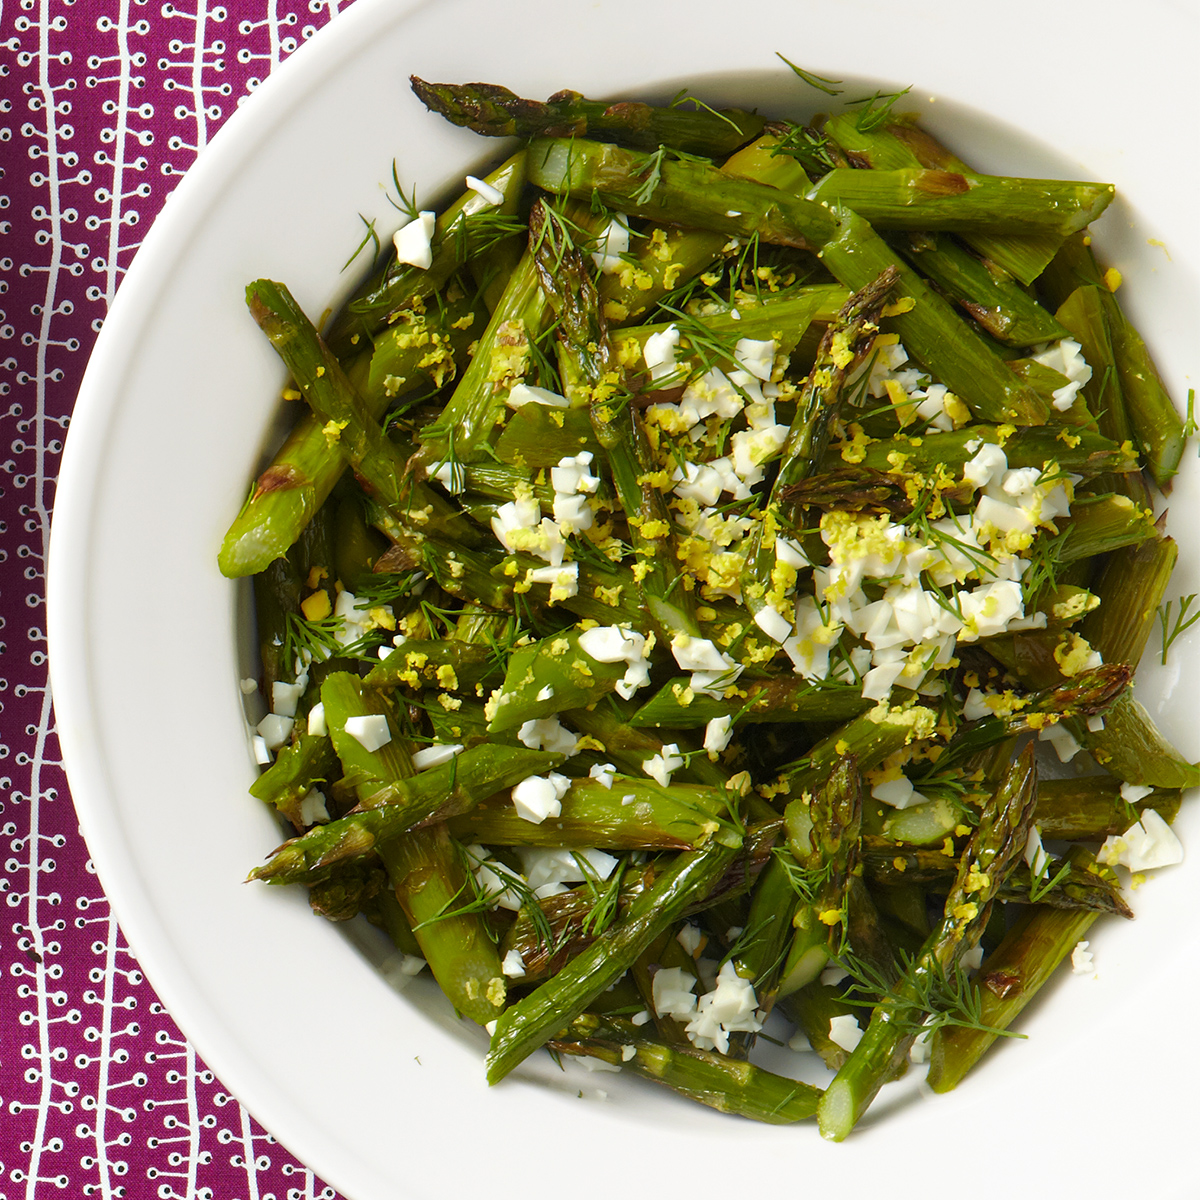 egg-cellent roasted asparagus